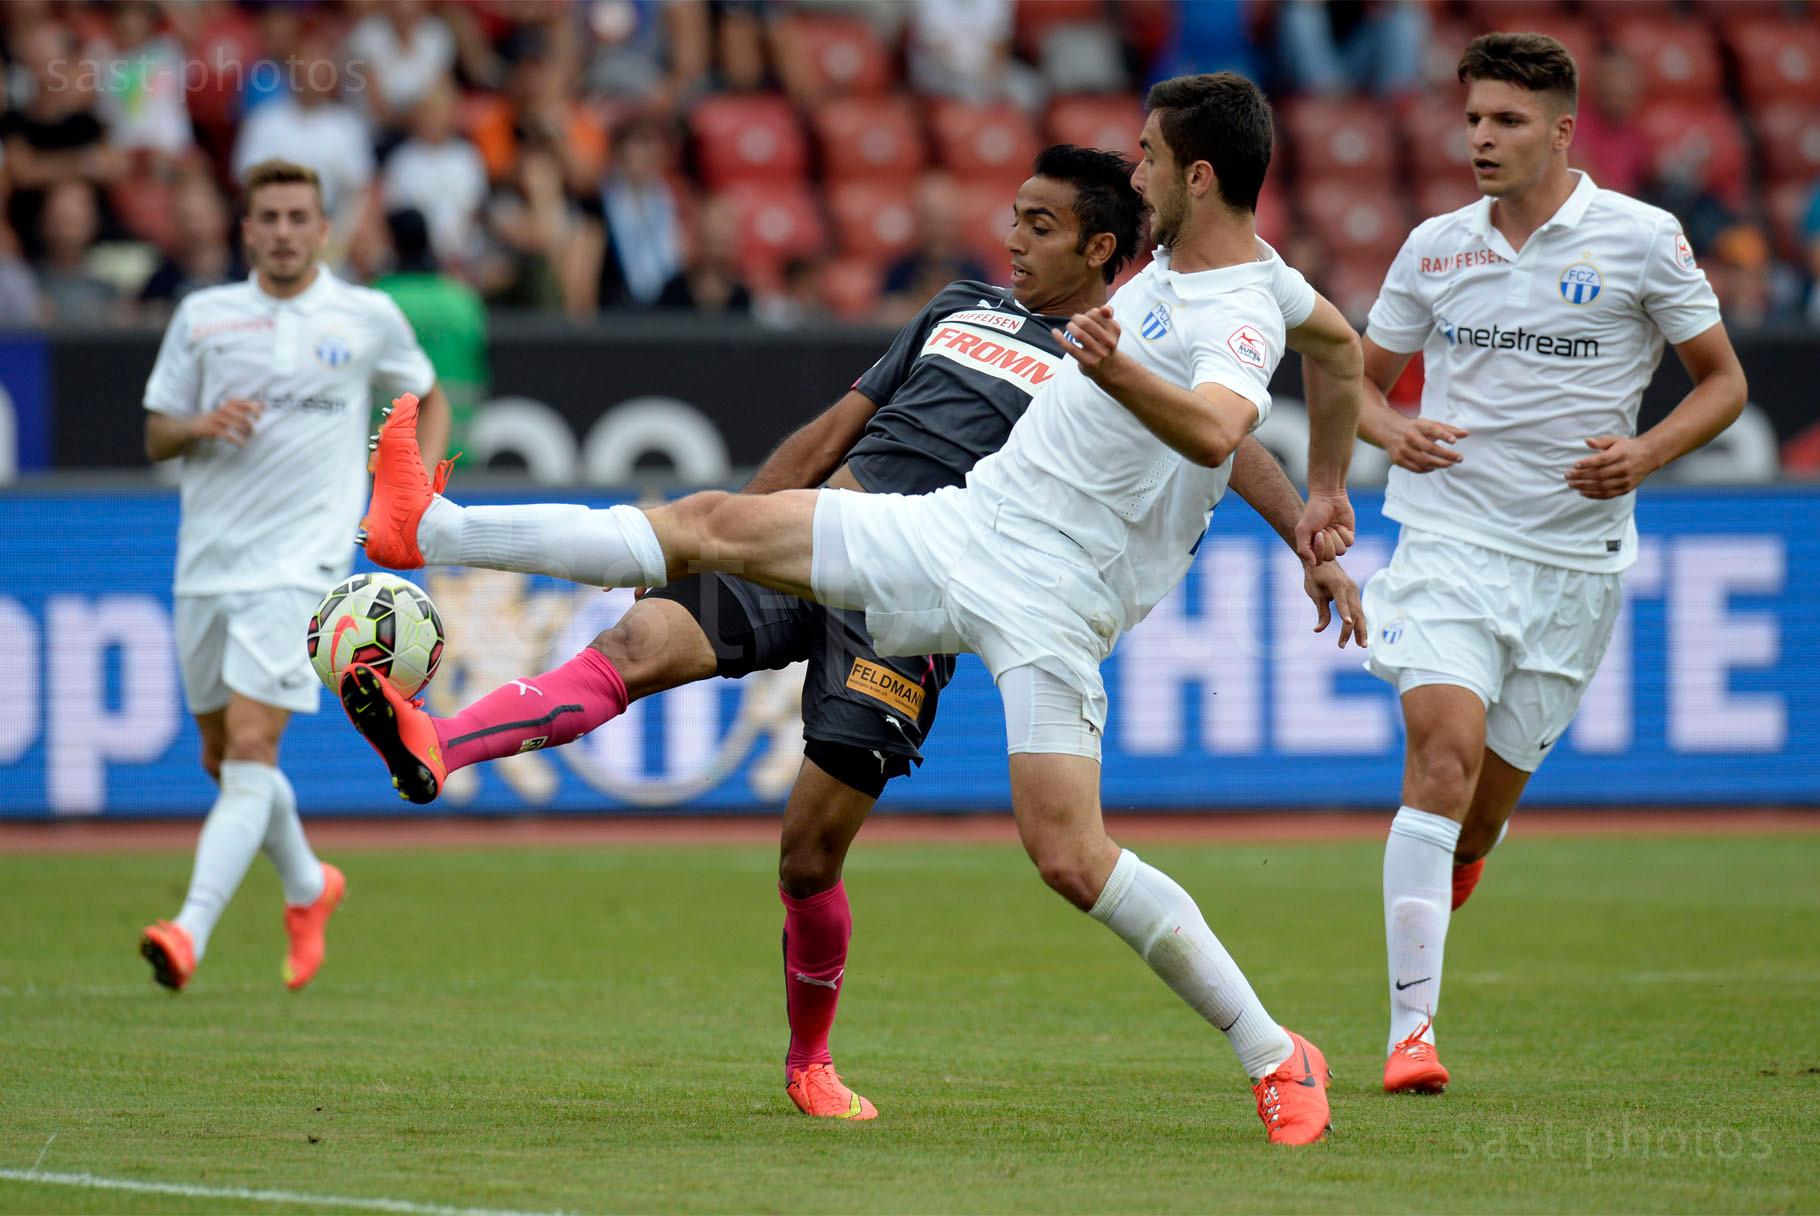 Mahmoud Kahraba (GCZ) gegen Ivan Kecojevic (FCZ)